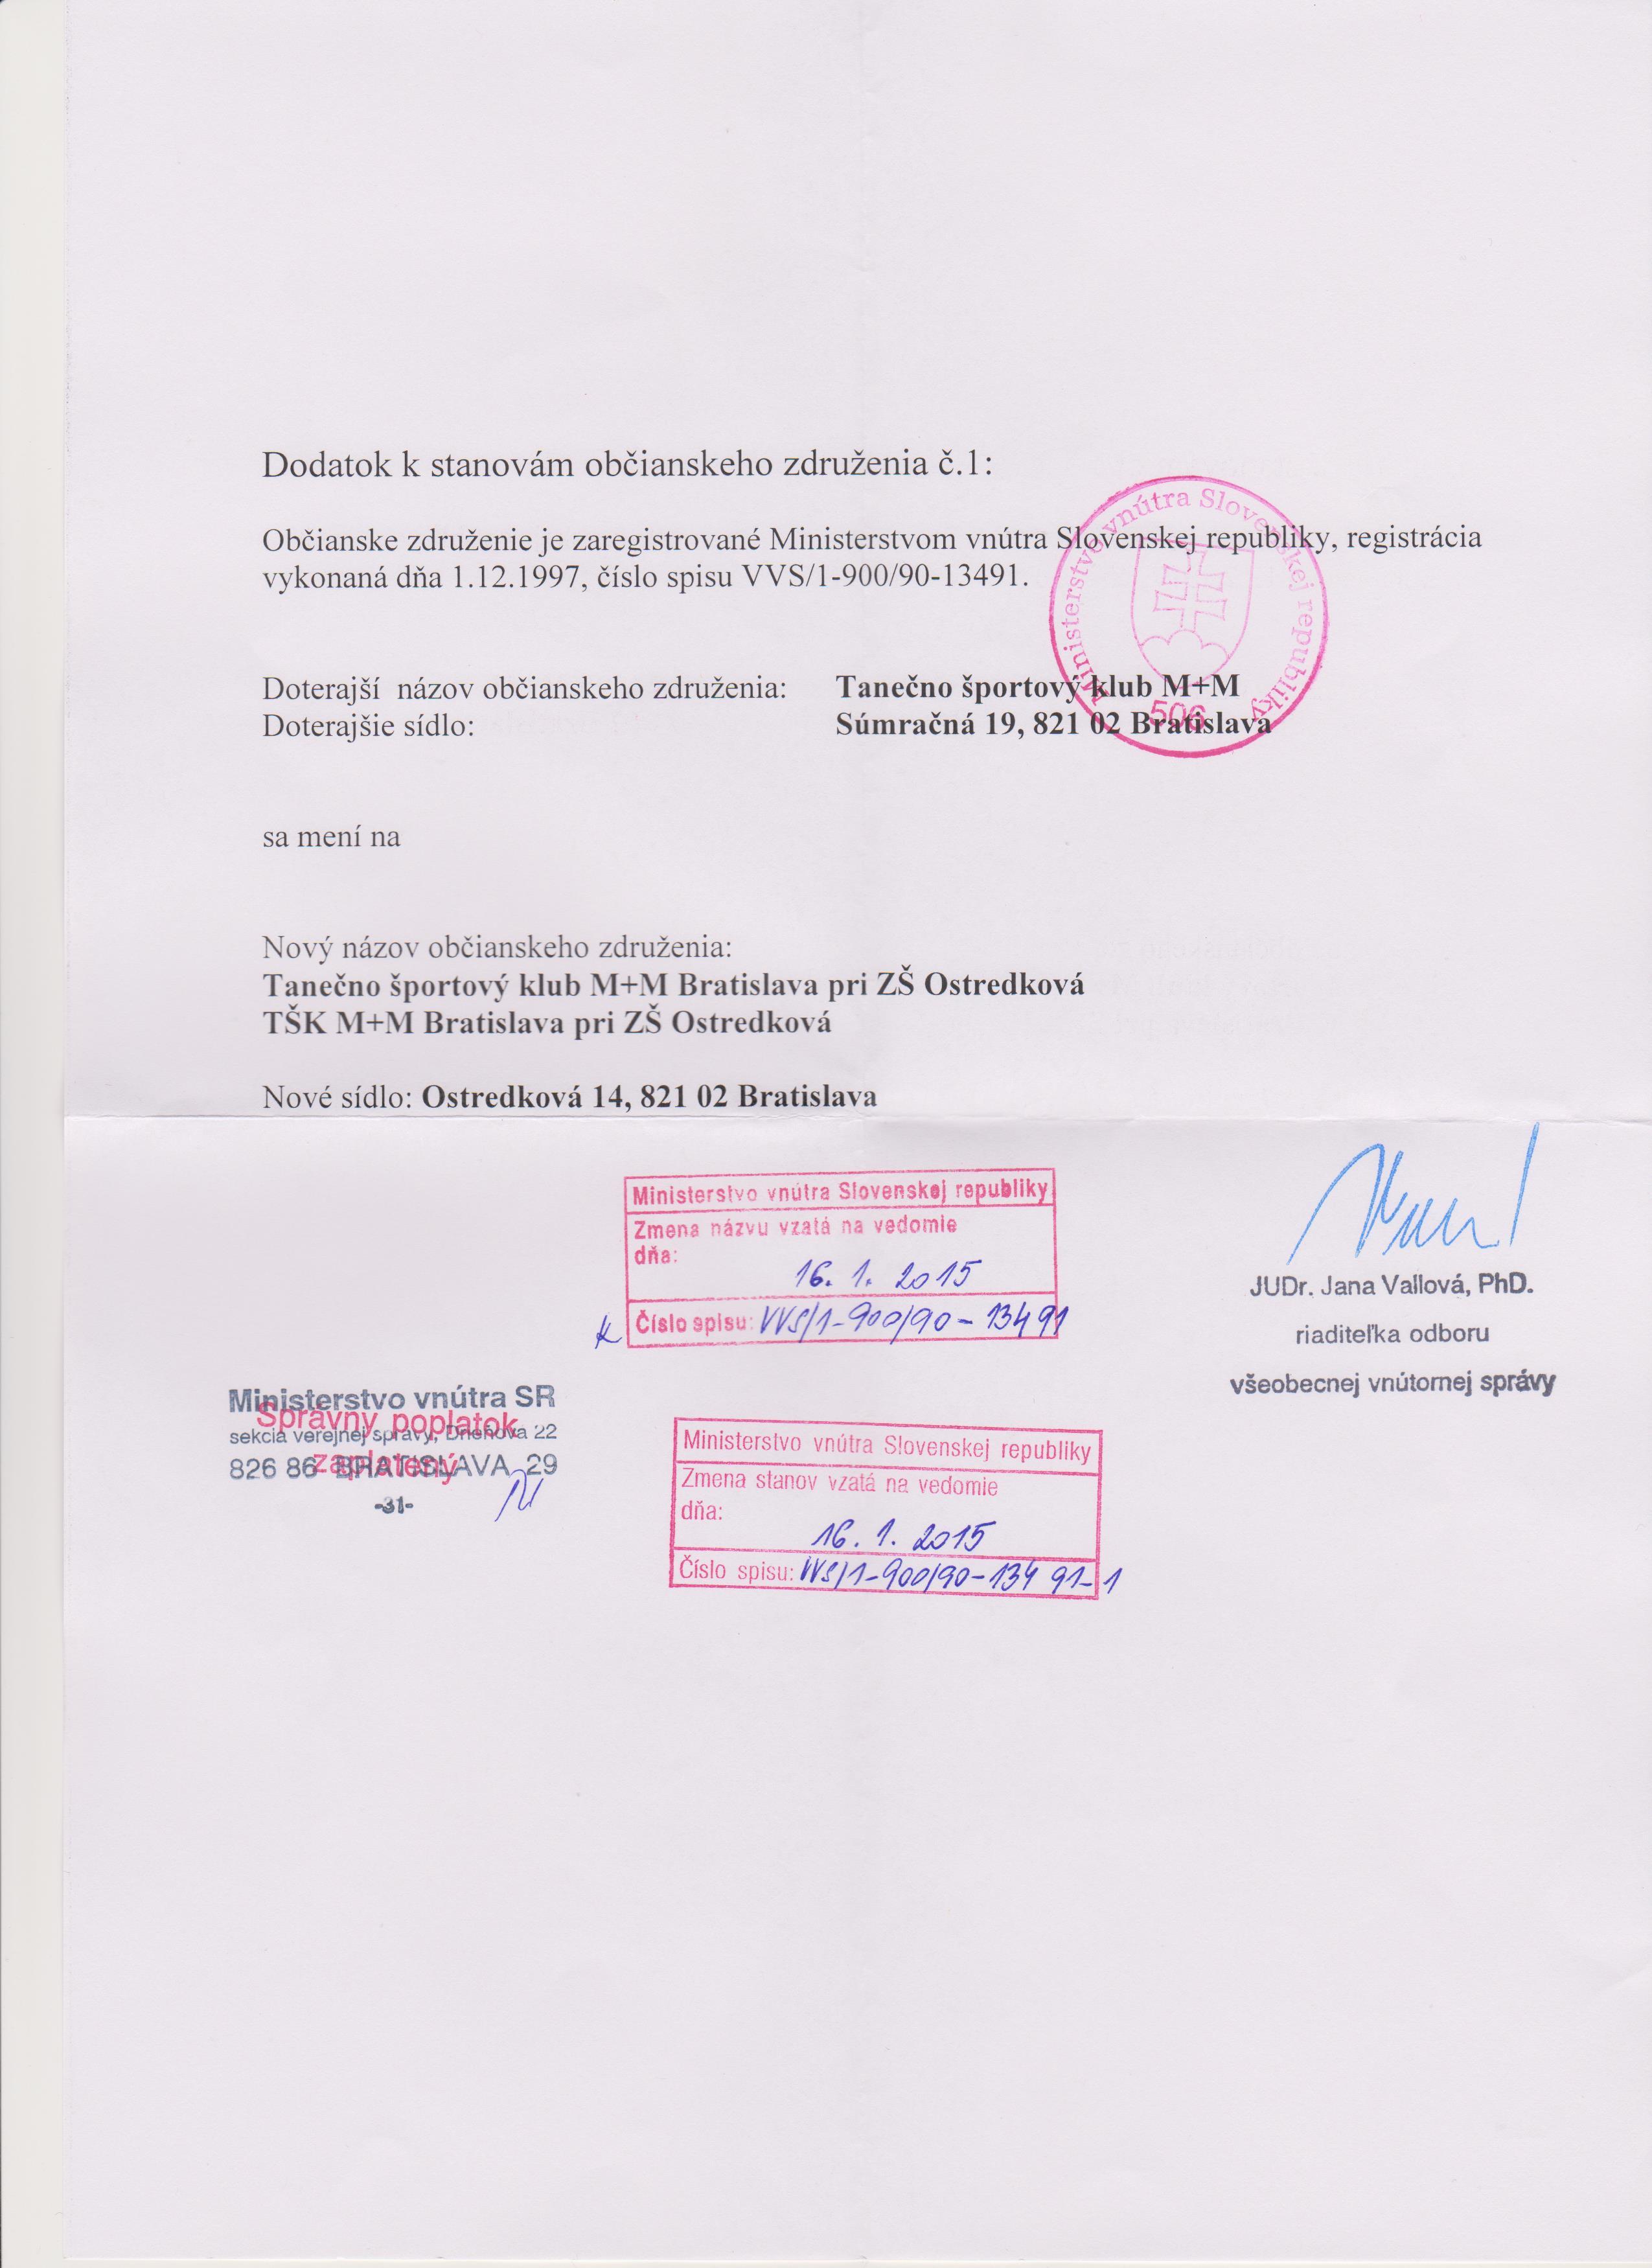 2.1TŠK M+M BA Dodatok k stanovám č.1 - 2015 MV SR